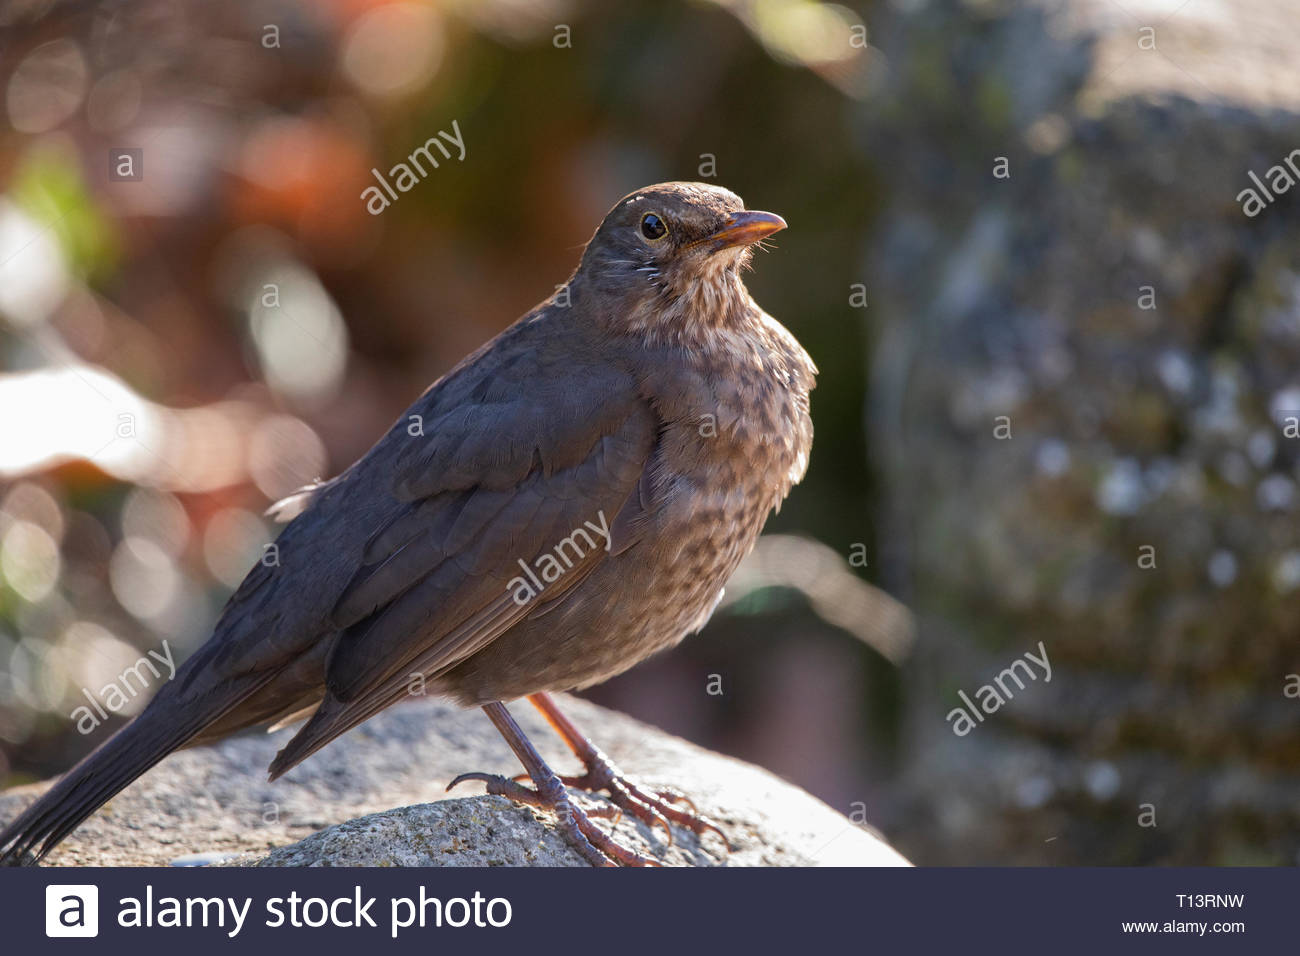 Female Blackbird - Stock Image